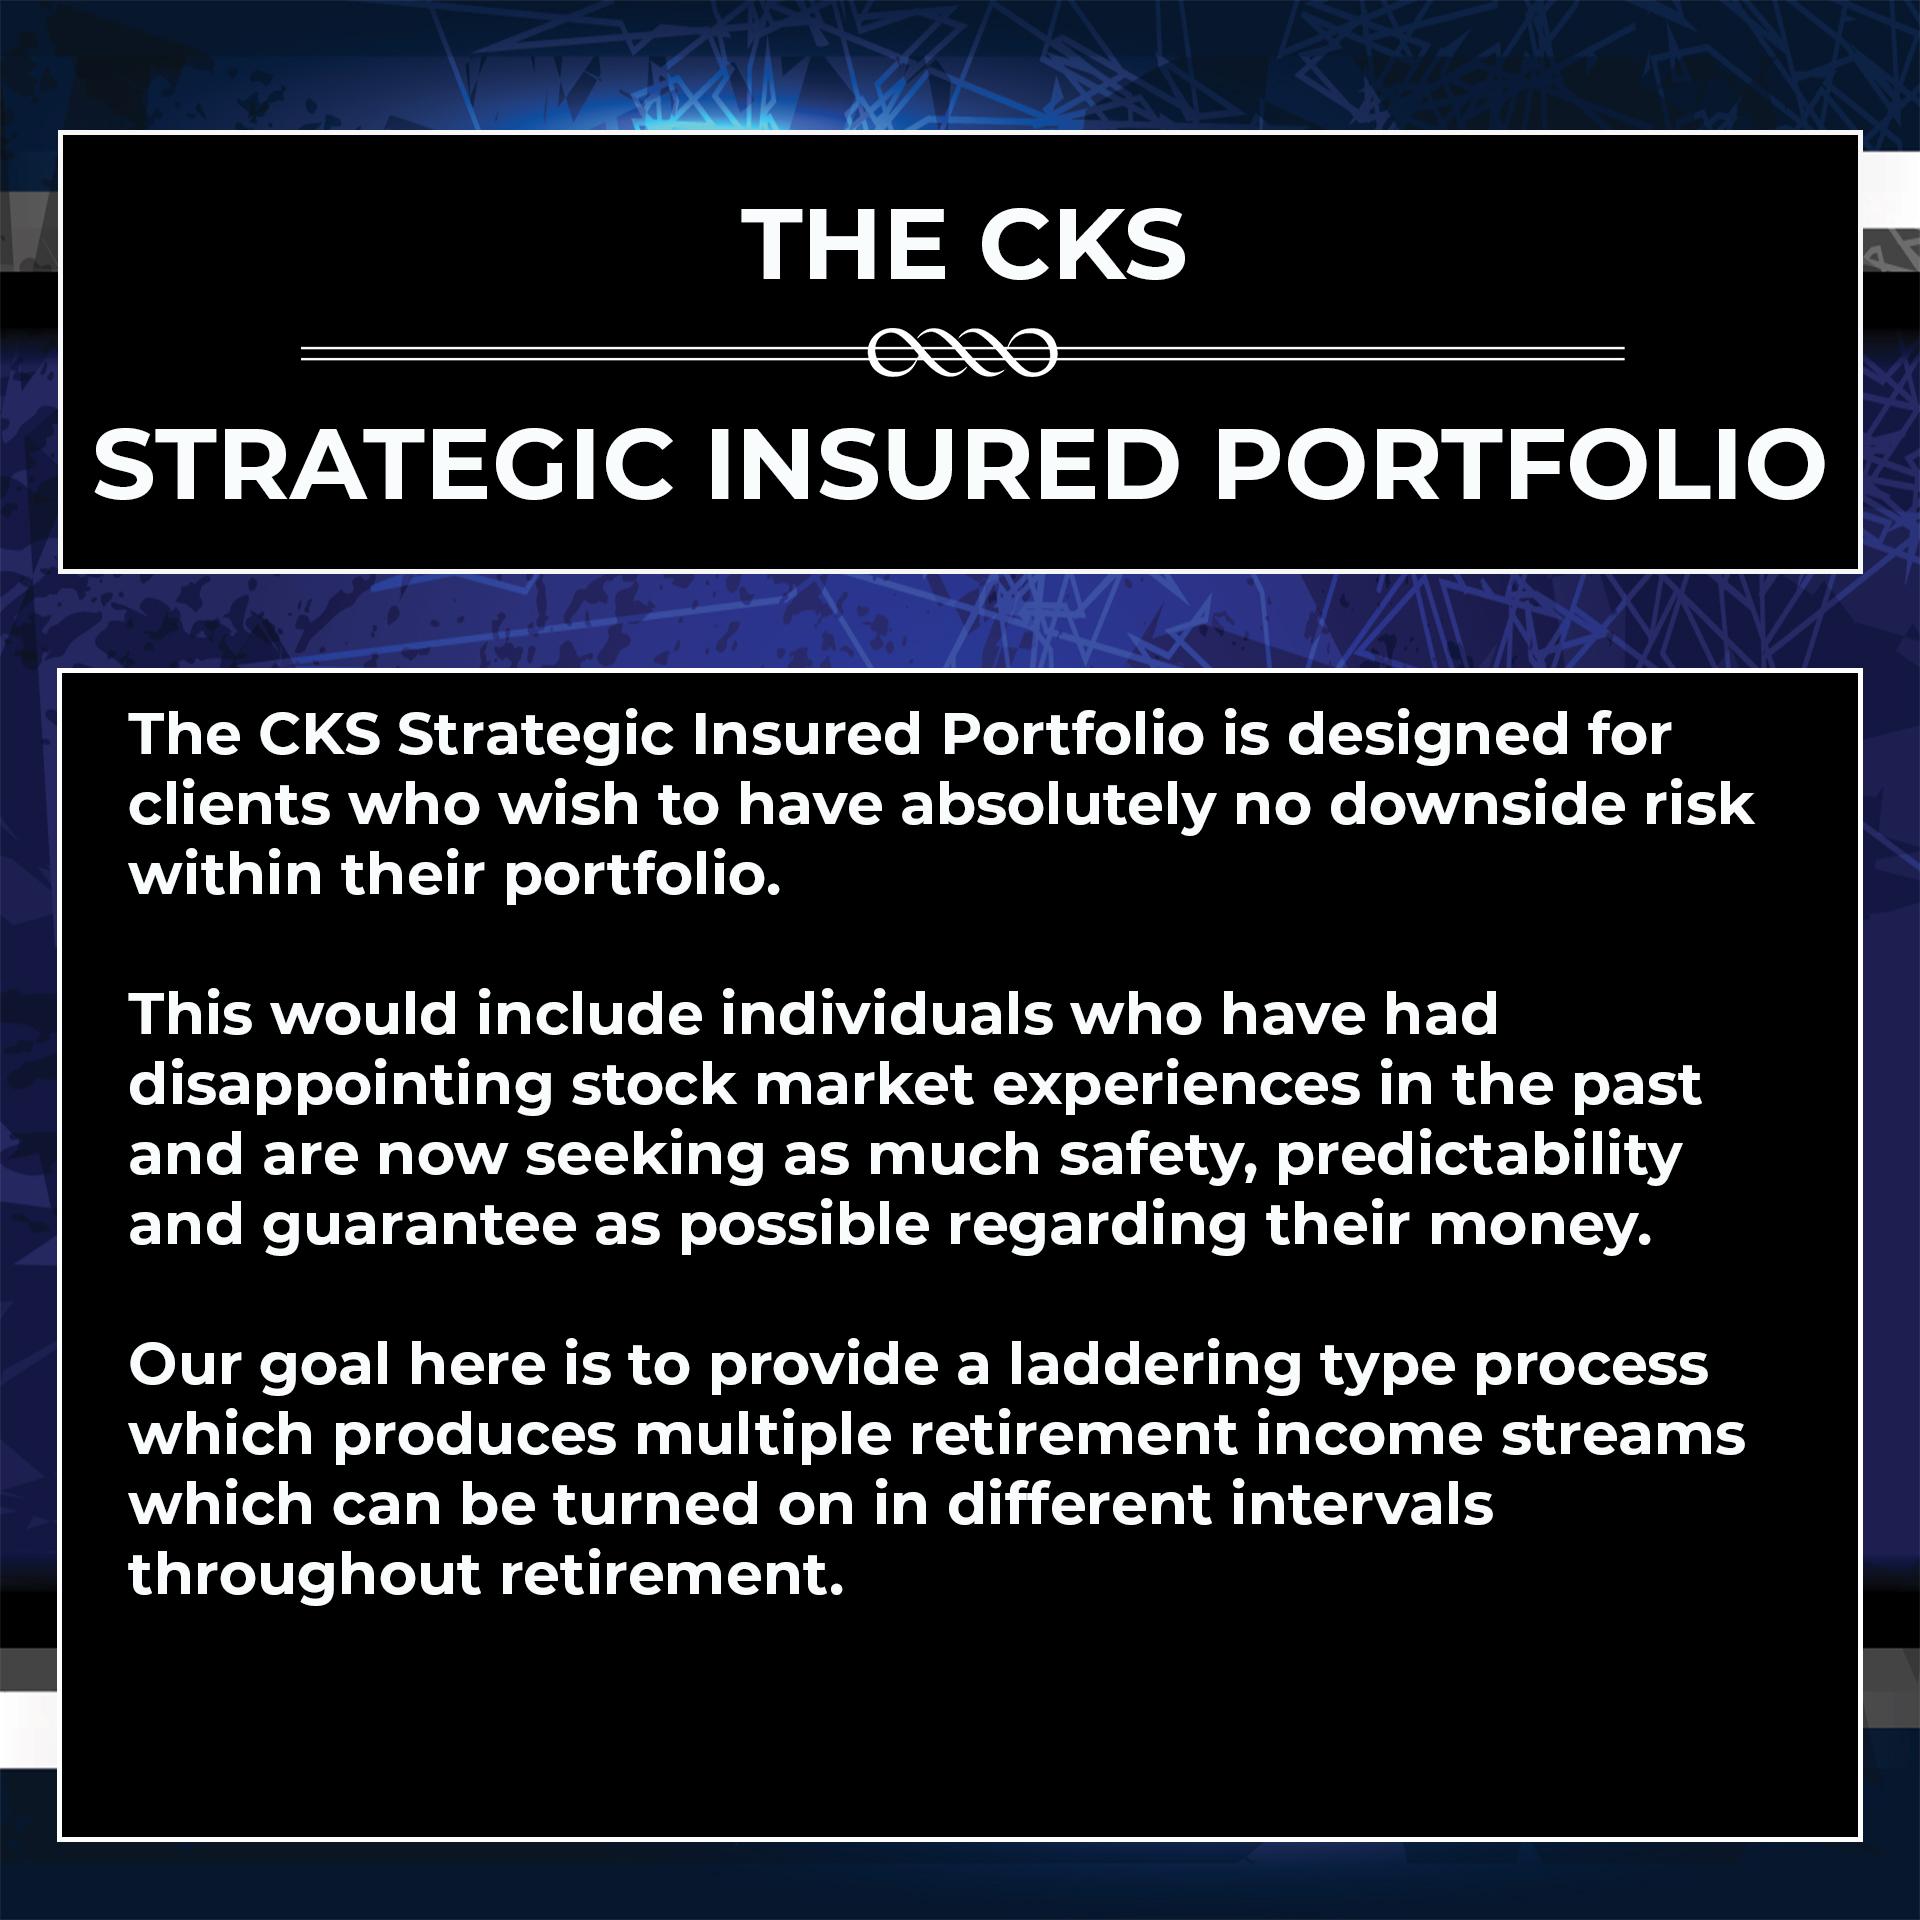 strategic insured portfolio